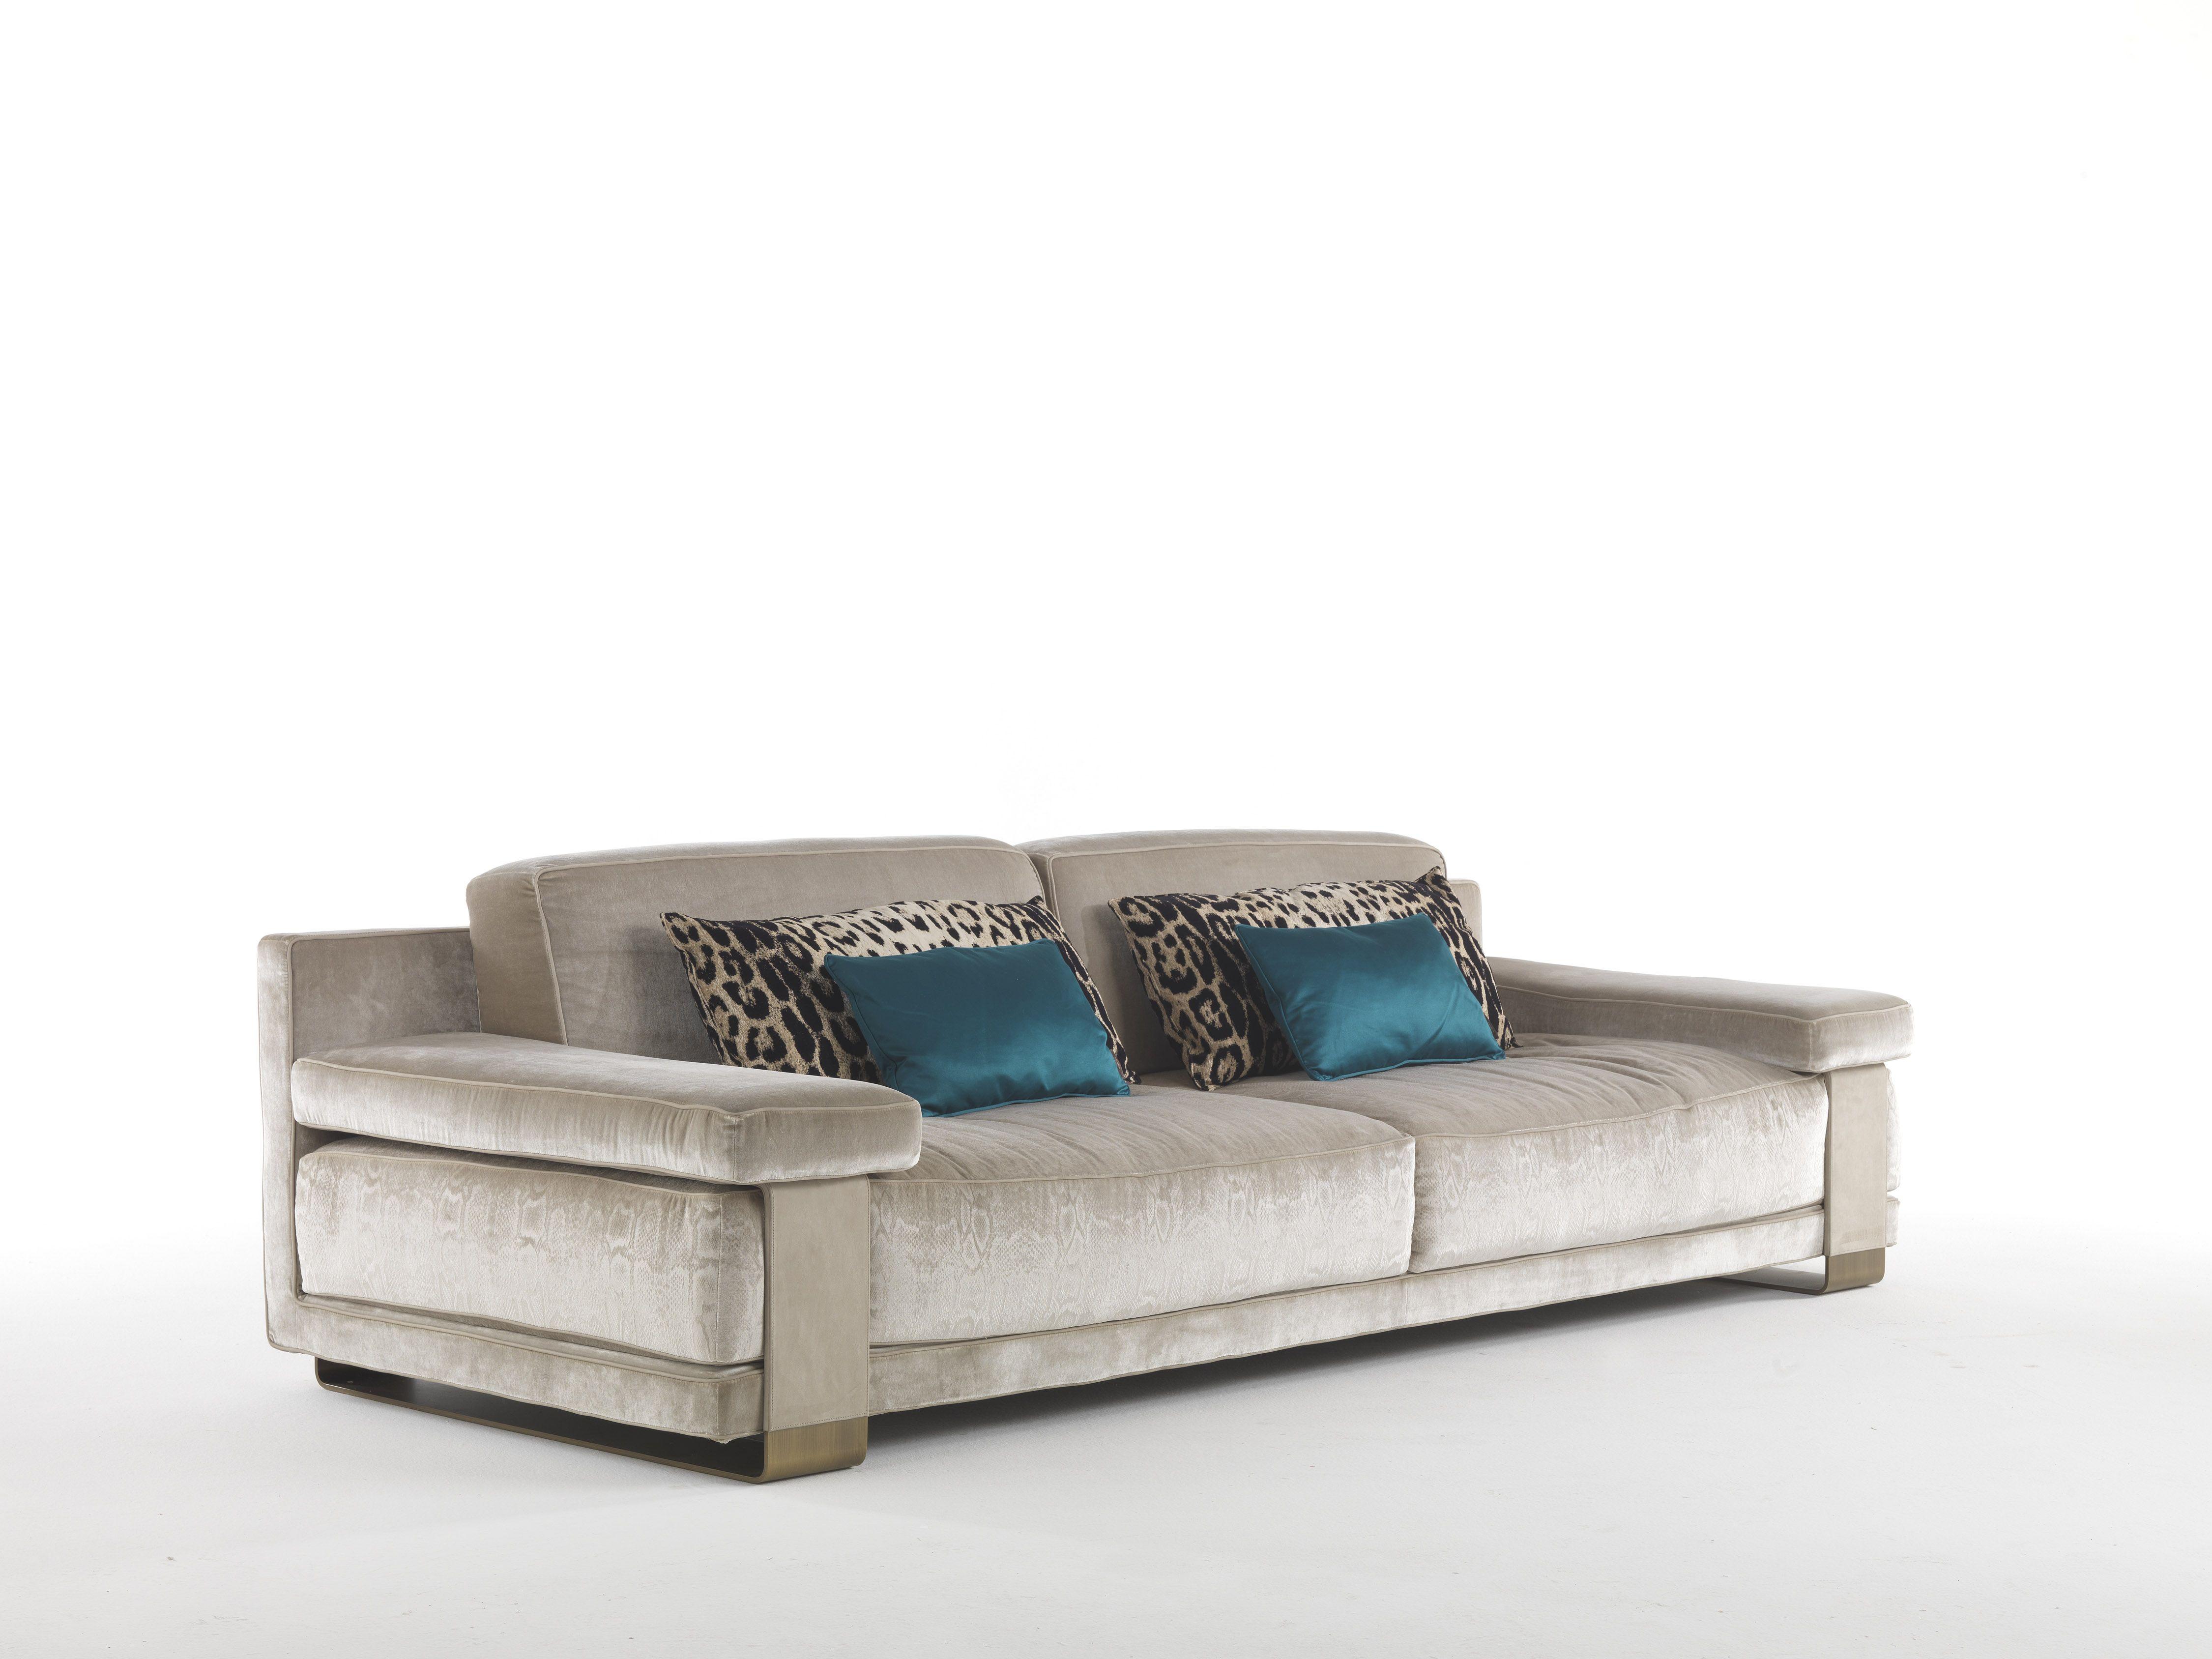 Roberto Cavalli Furniture Kingsofchelsea Roberto Cavalli Furnituredesign Sofa Furniture Sofa Sofa Design